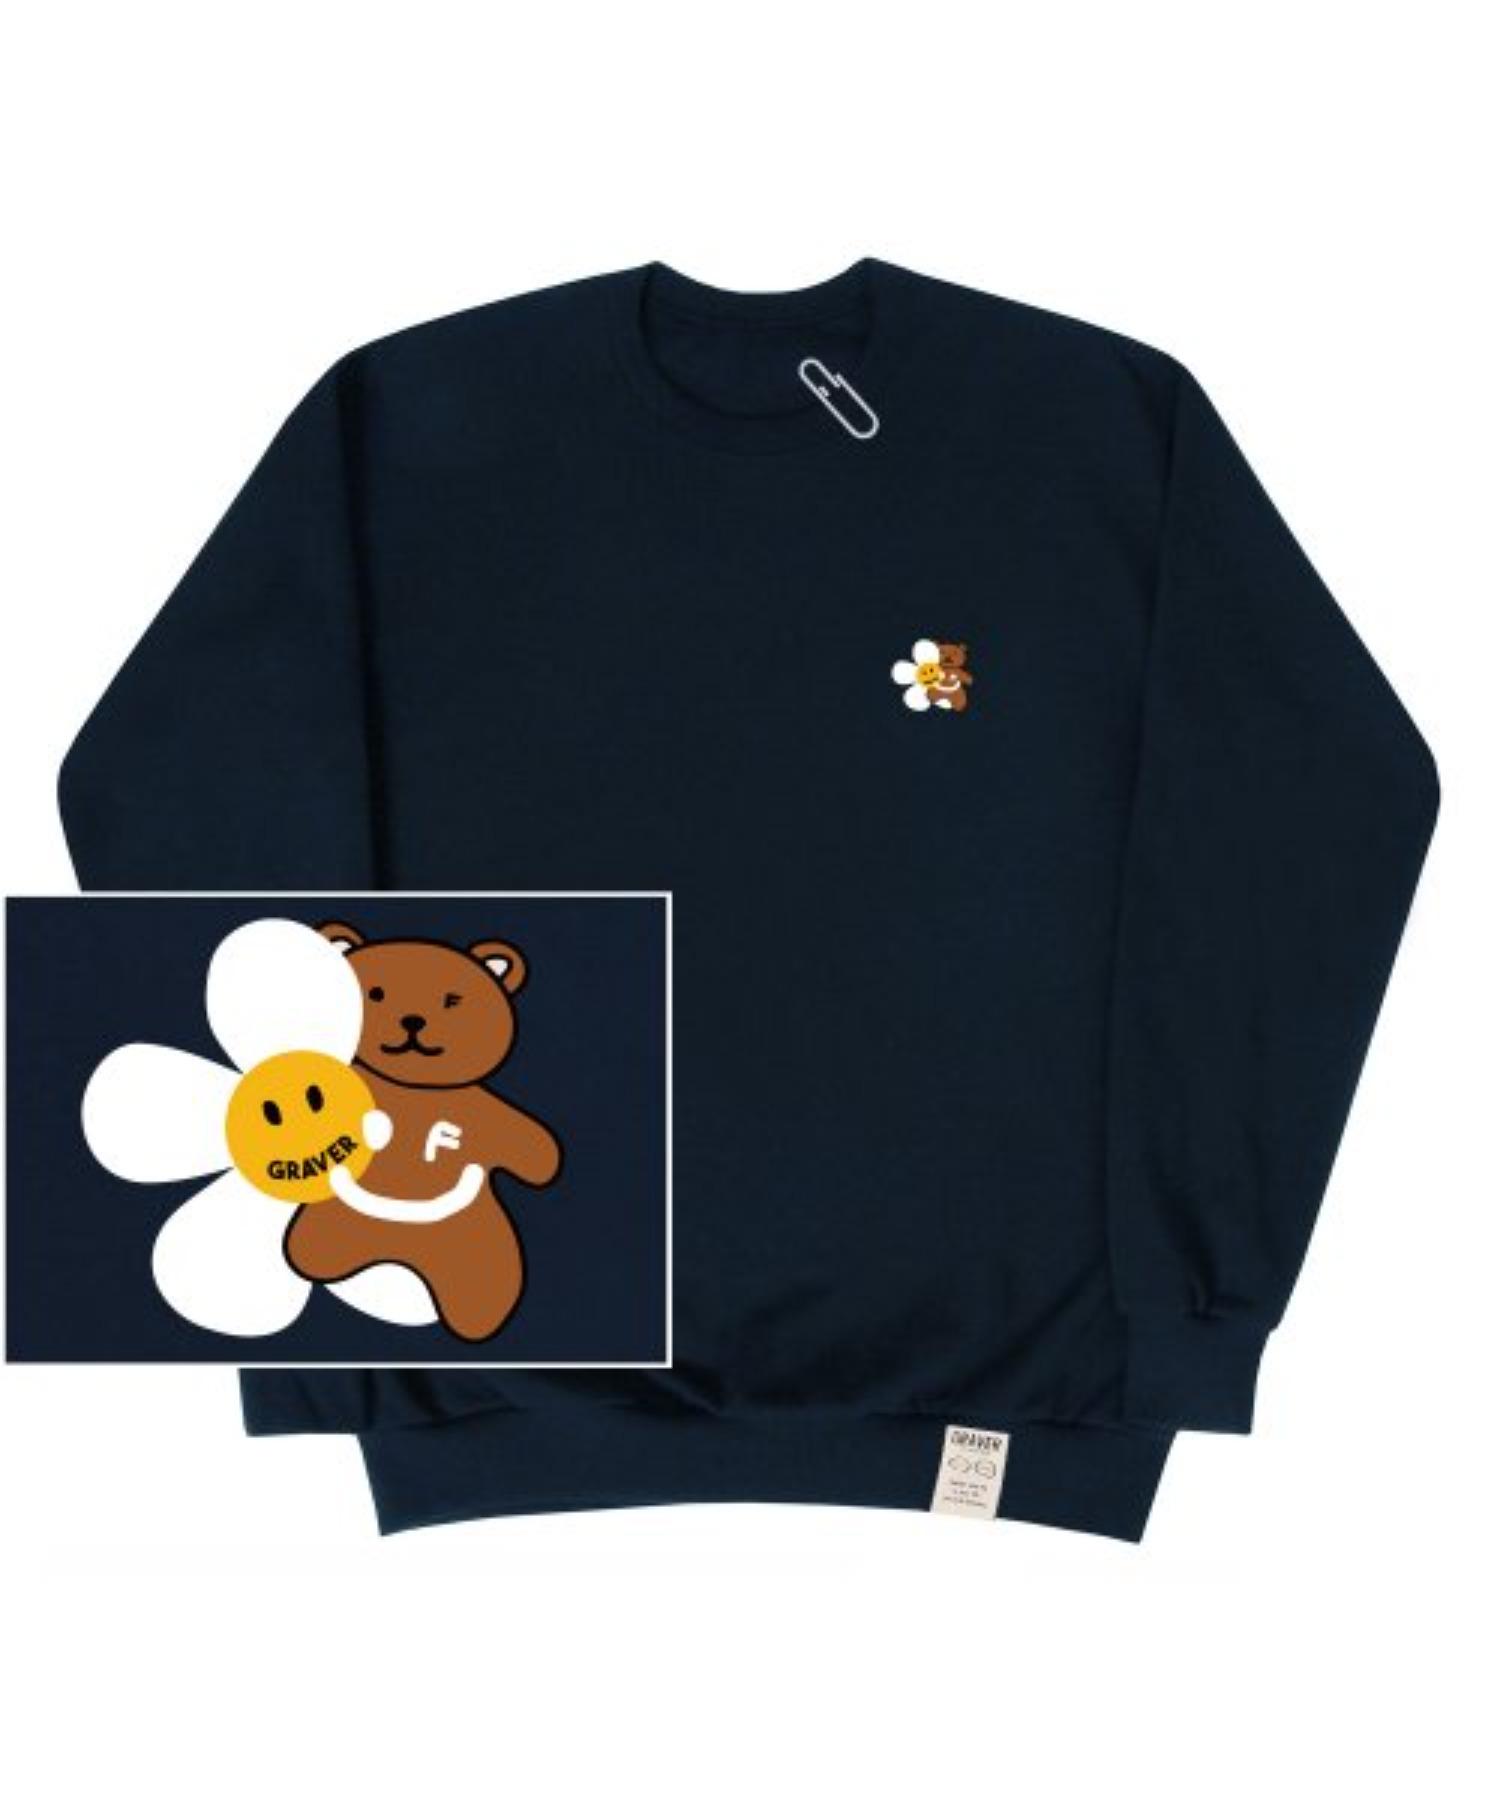 [UNISEX] Small Flower Bear Smile White Clip Sweatshirt_Navy